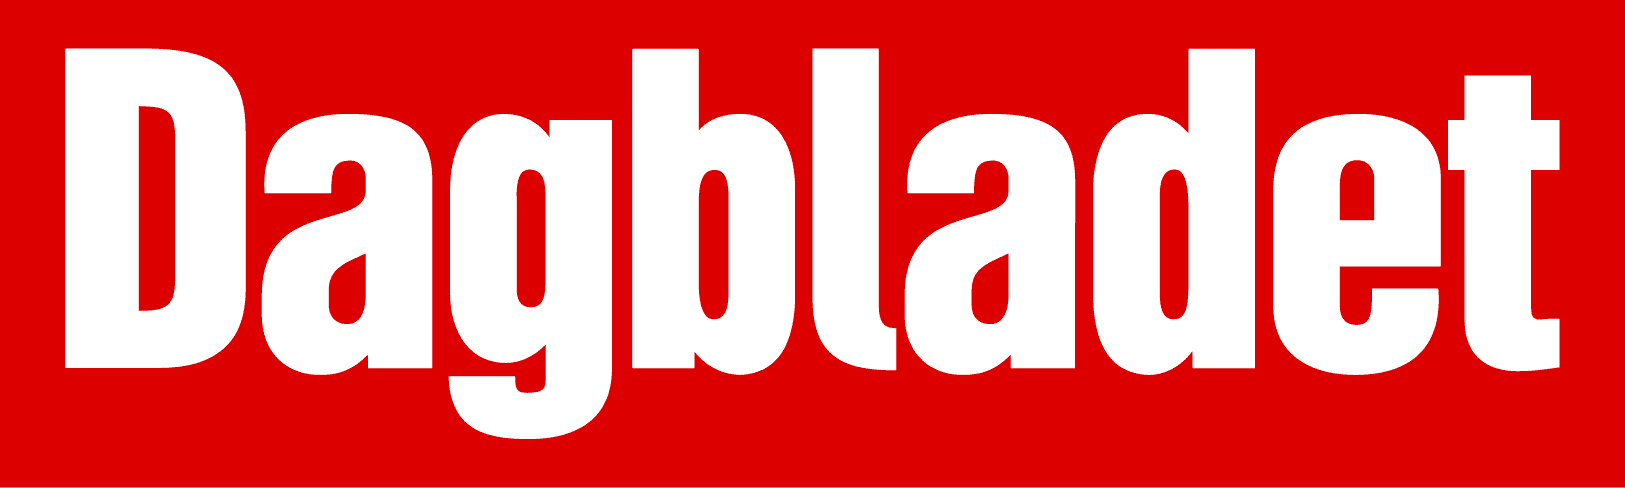 dagbladet-logo-rgb-01.png